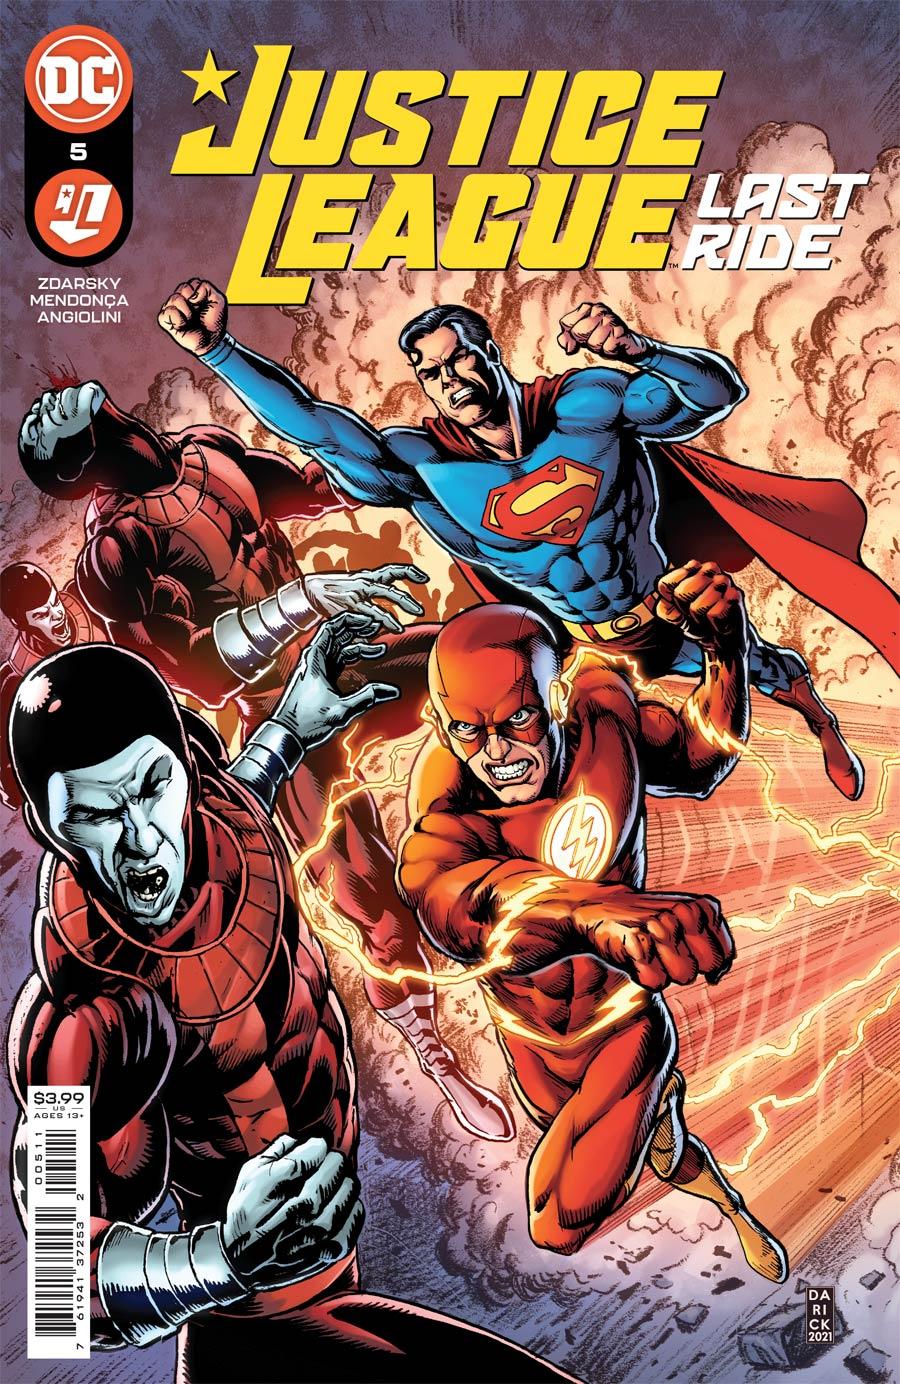 Justice League Last Ride #5 Cover A Regular Darick Robertson Cover